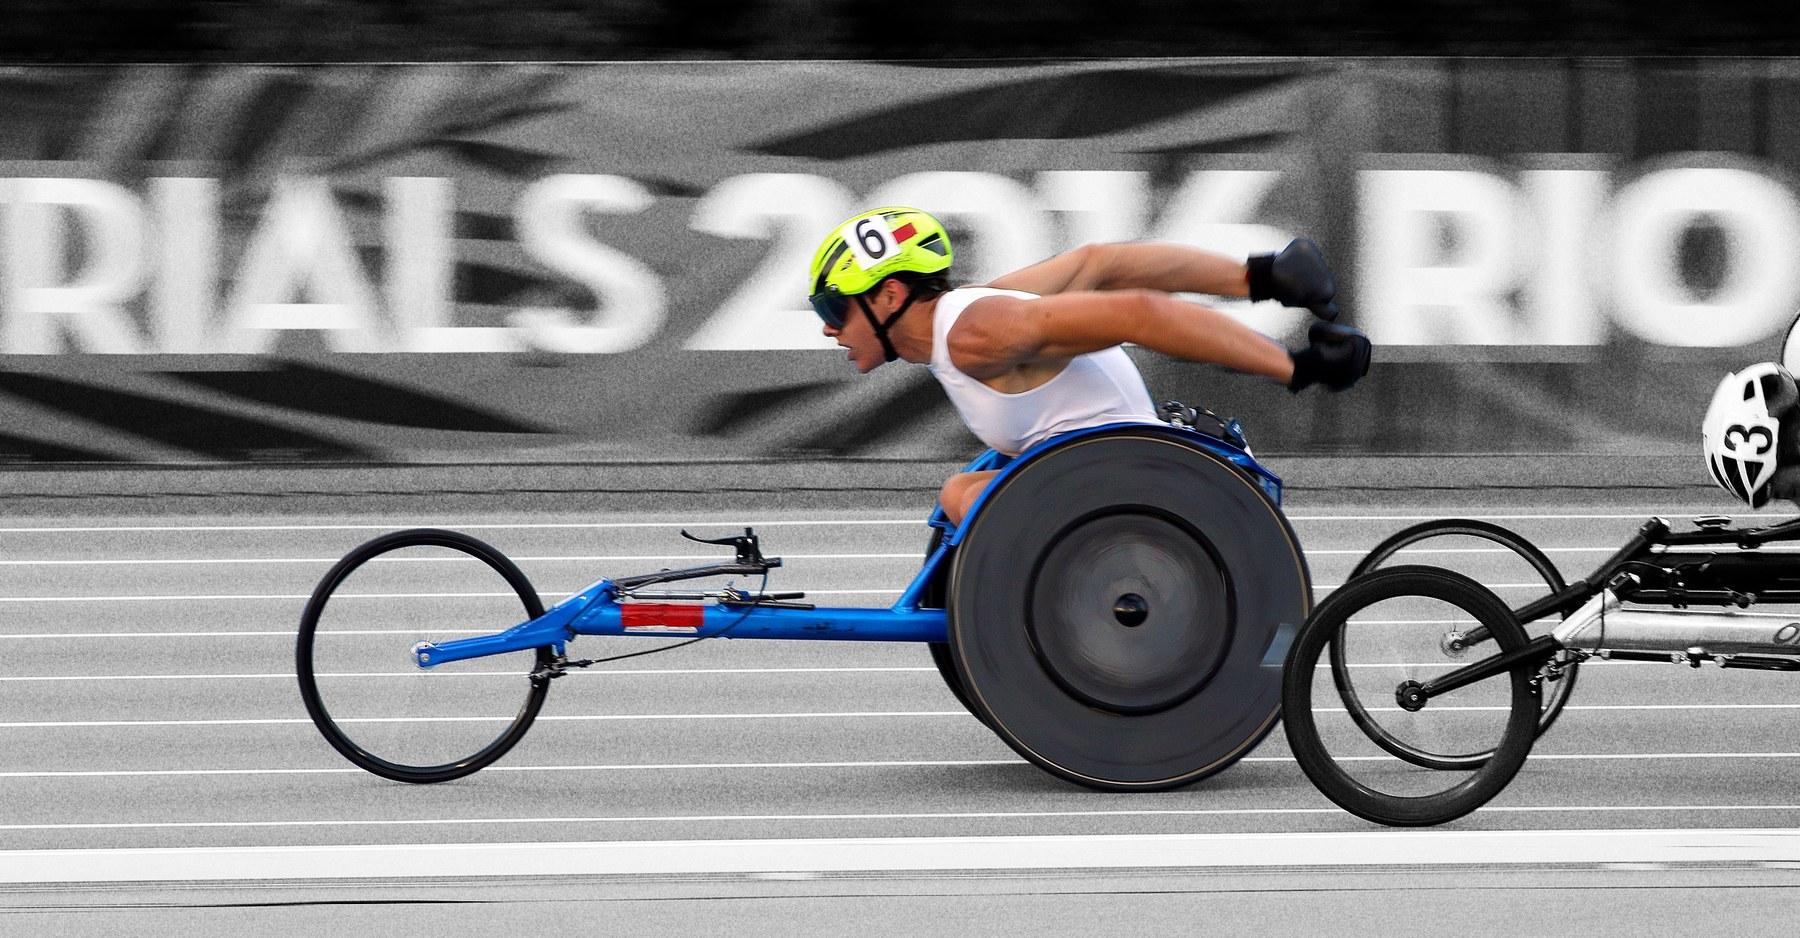 Daniel Romanchuk wins the New York Marathon. Photo by Bob Leverone/Getty Images